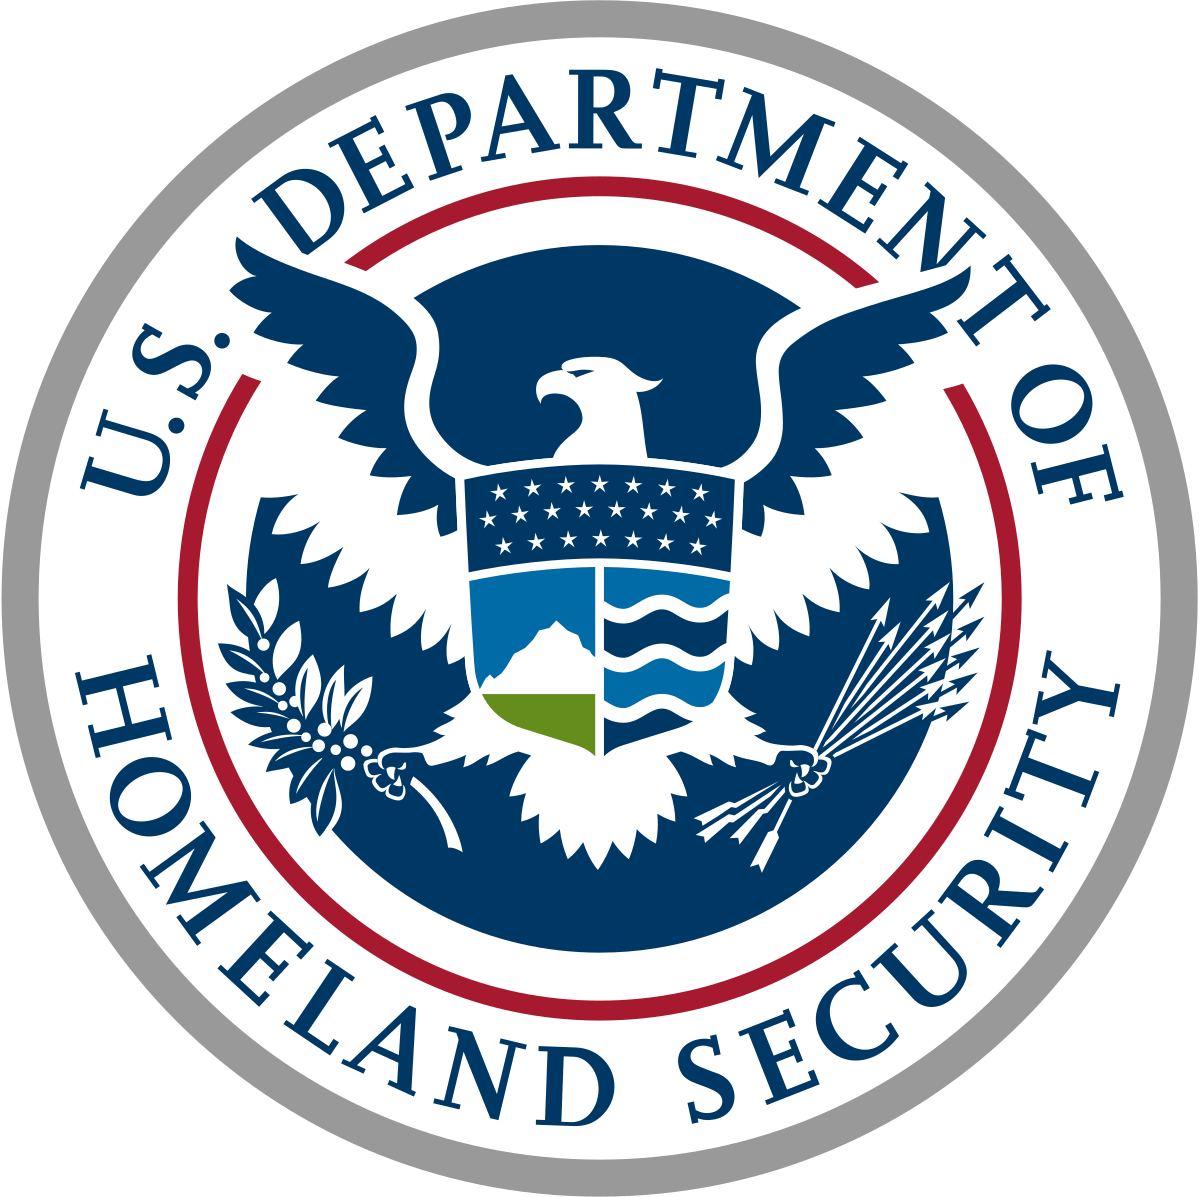 U.S. Department of State Diplomatic Security logo